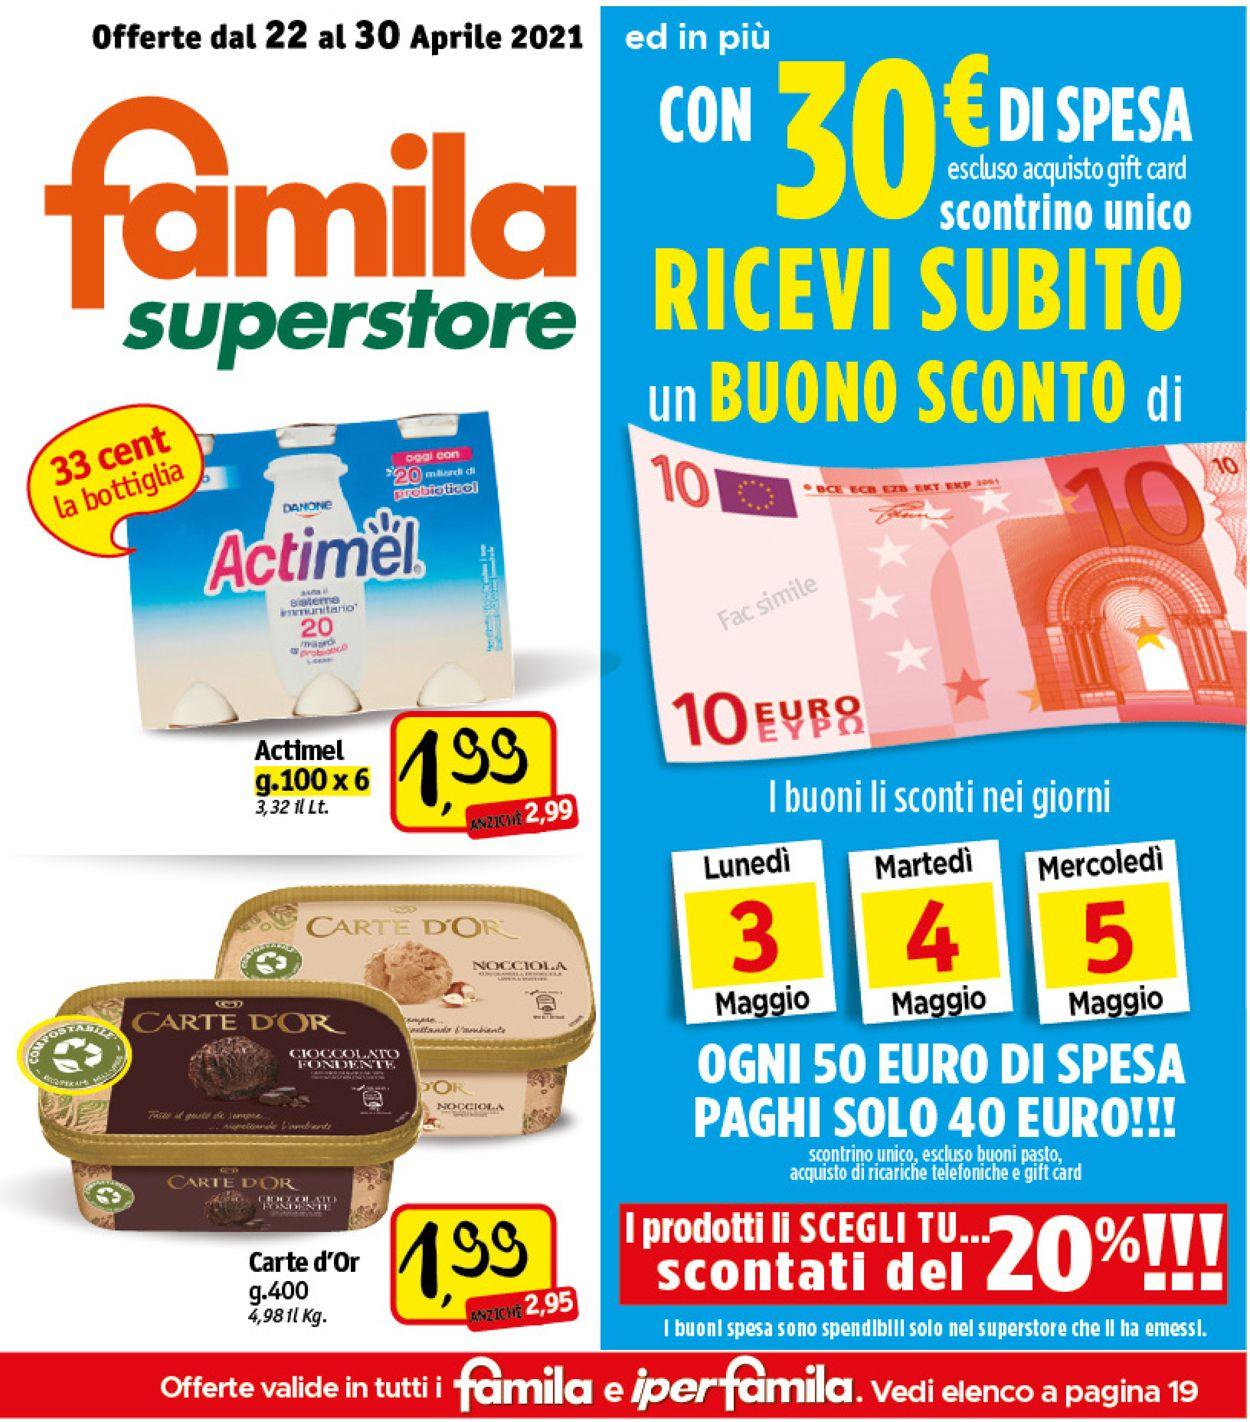 Volantino Famila - Offerte 22/04-30/04/2021